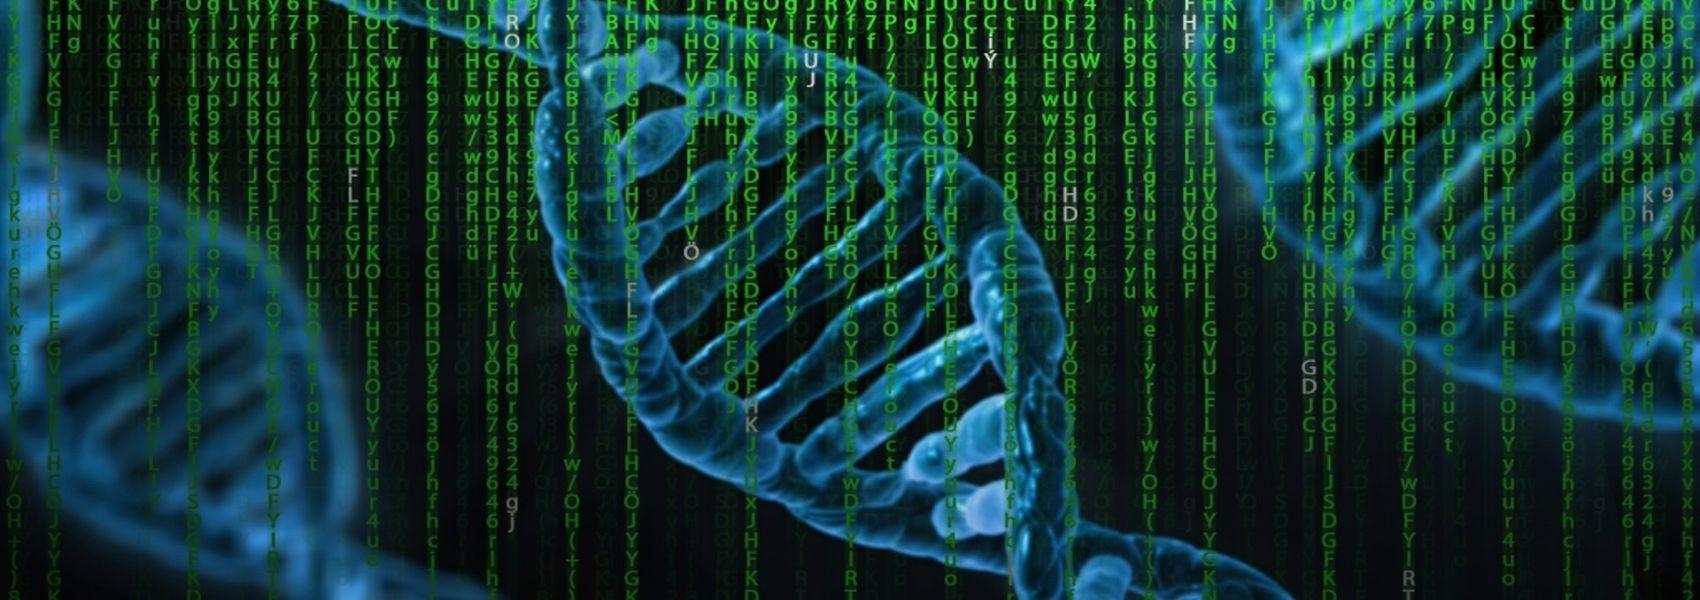 infertilidade masculina nos genes